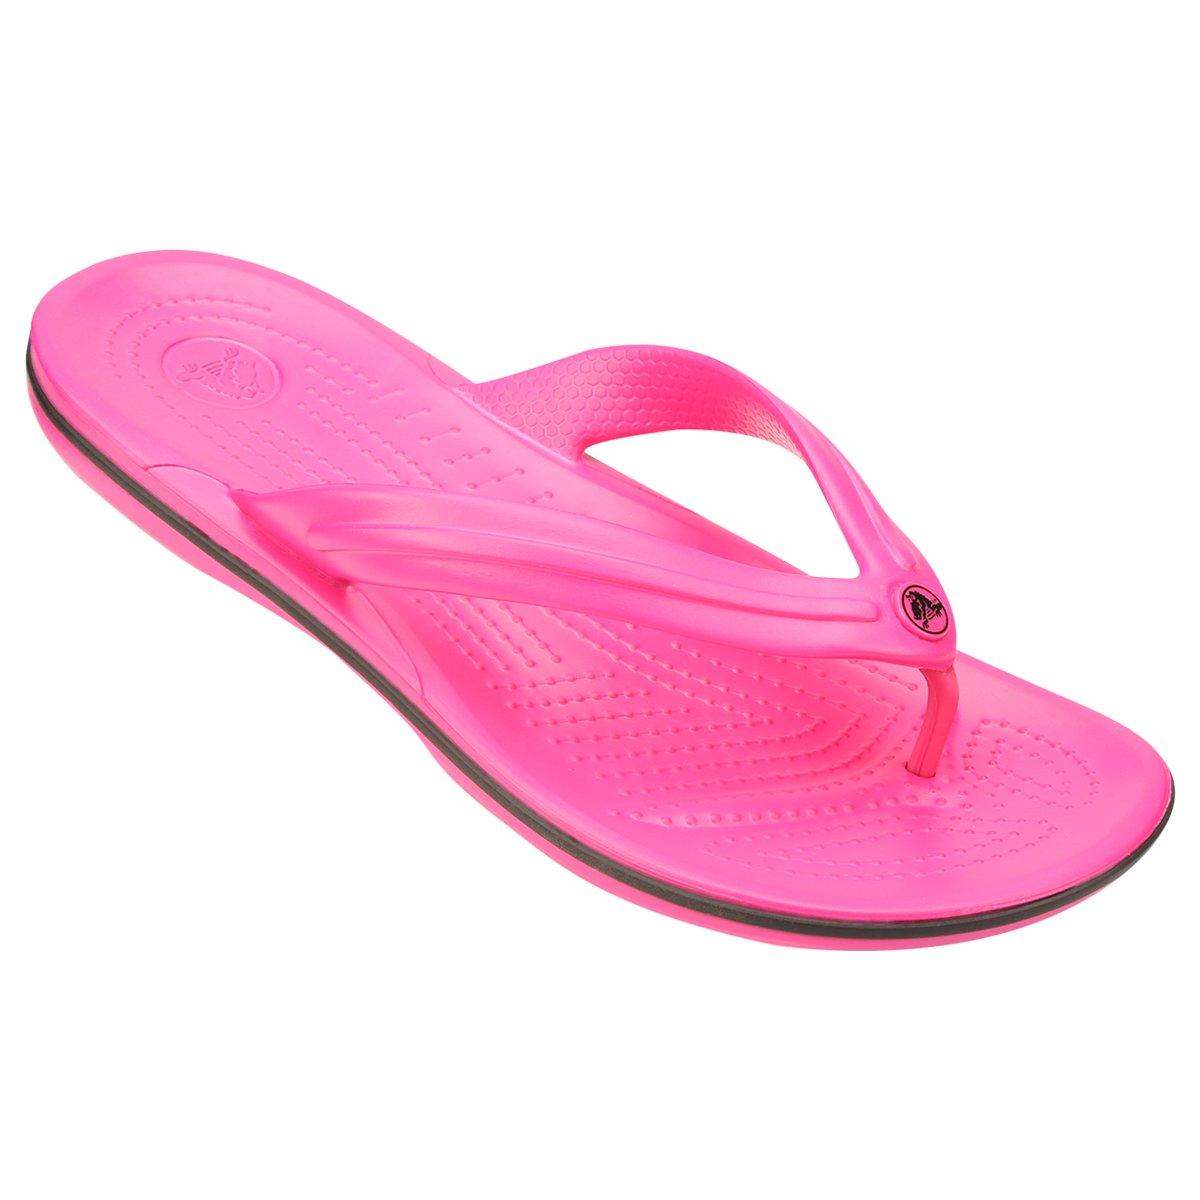 c29ffb4e1 Chinelo Crocs Crocband Flip - Pink e Preto - Compre Agora | Netshoes